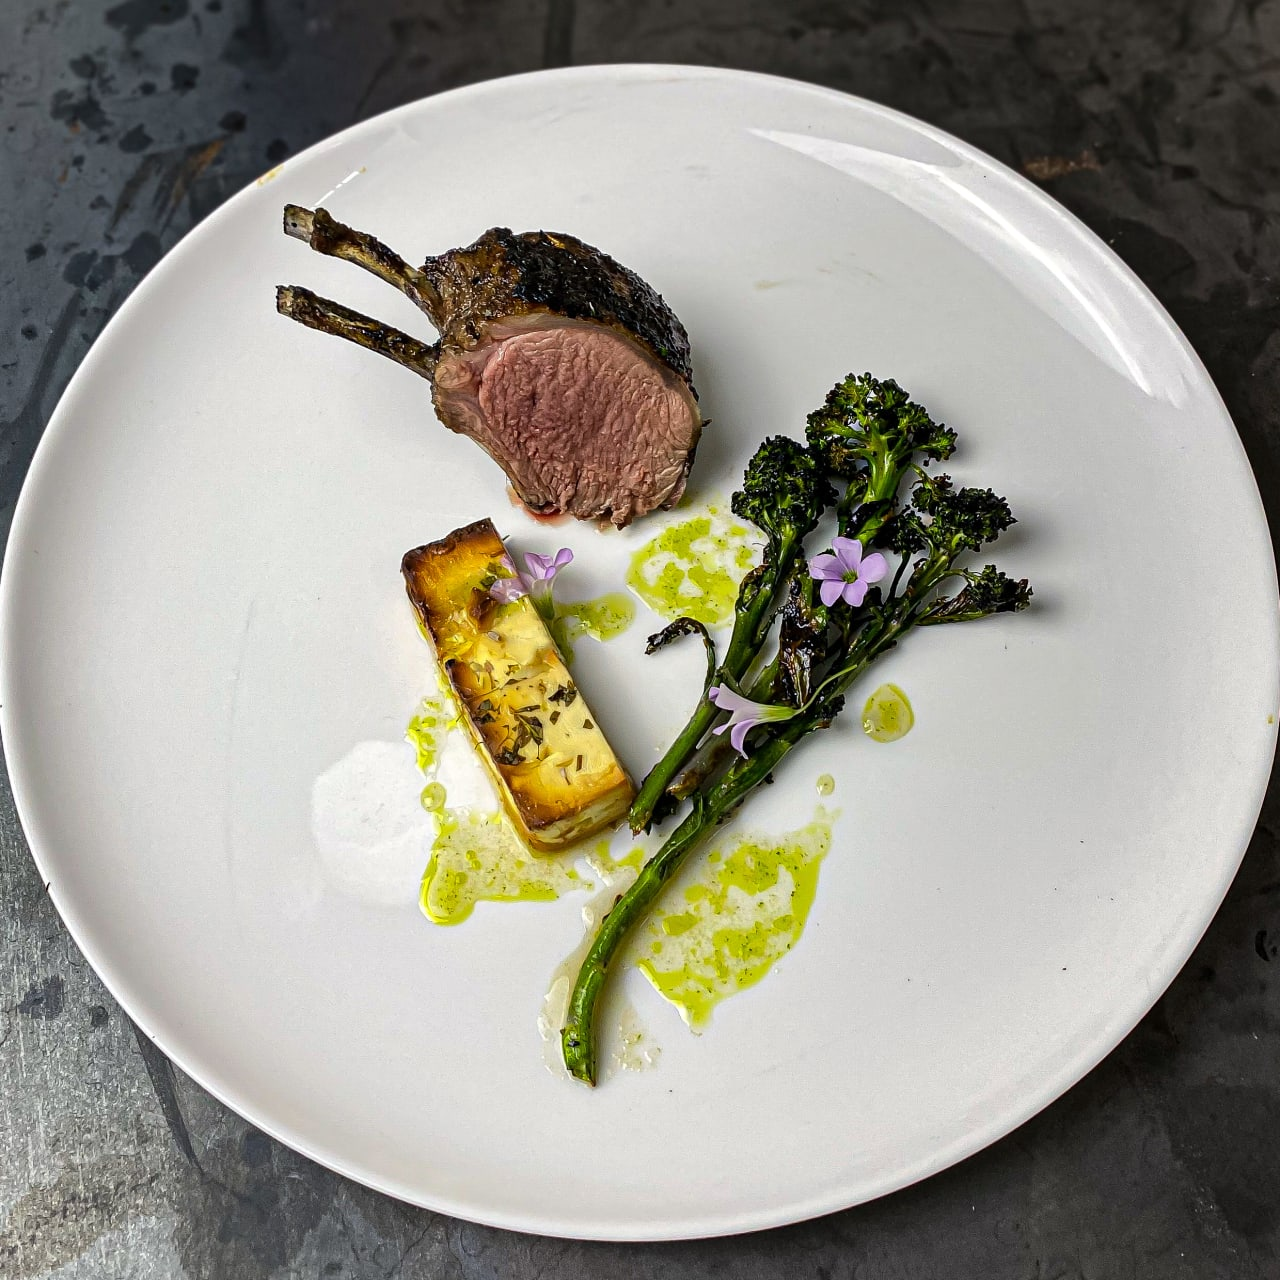 BBQ Lamb Rack with Honey & Lavender Baked Feta, Purple Spouting Broccoli